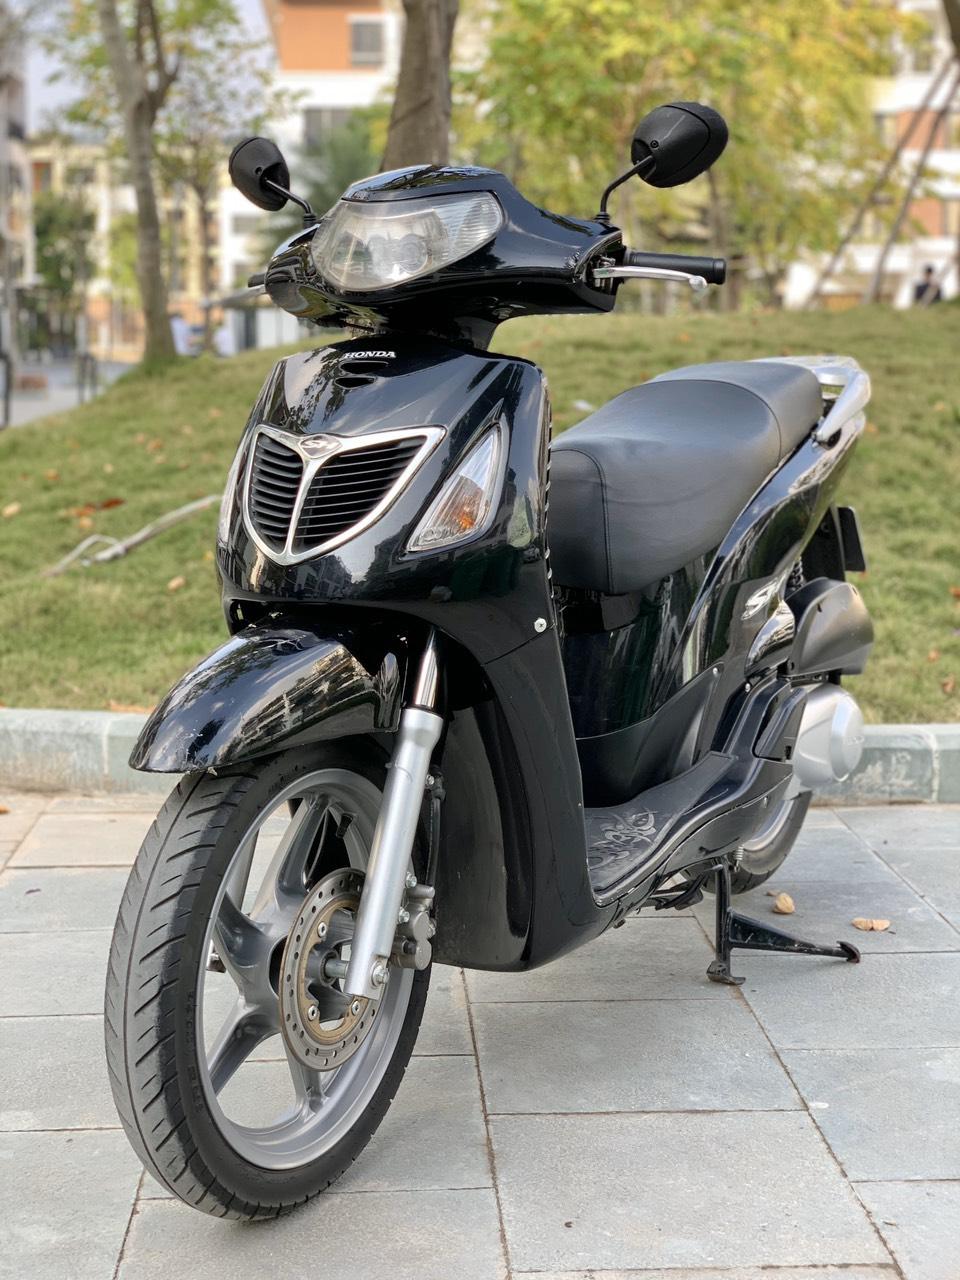 Honda SH 150 - 2005 - Usato 42.770 Km, 1.100 €, a Milano